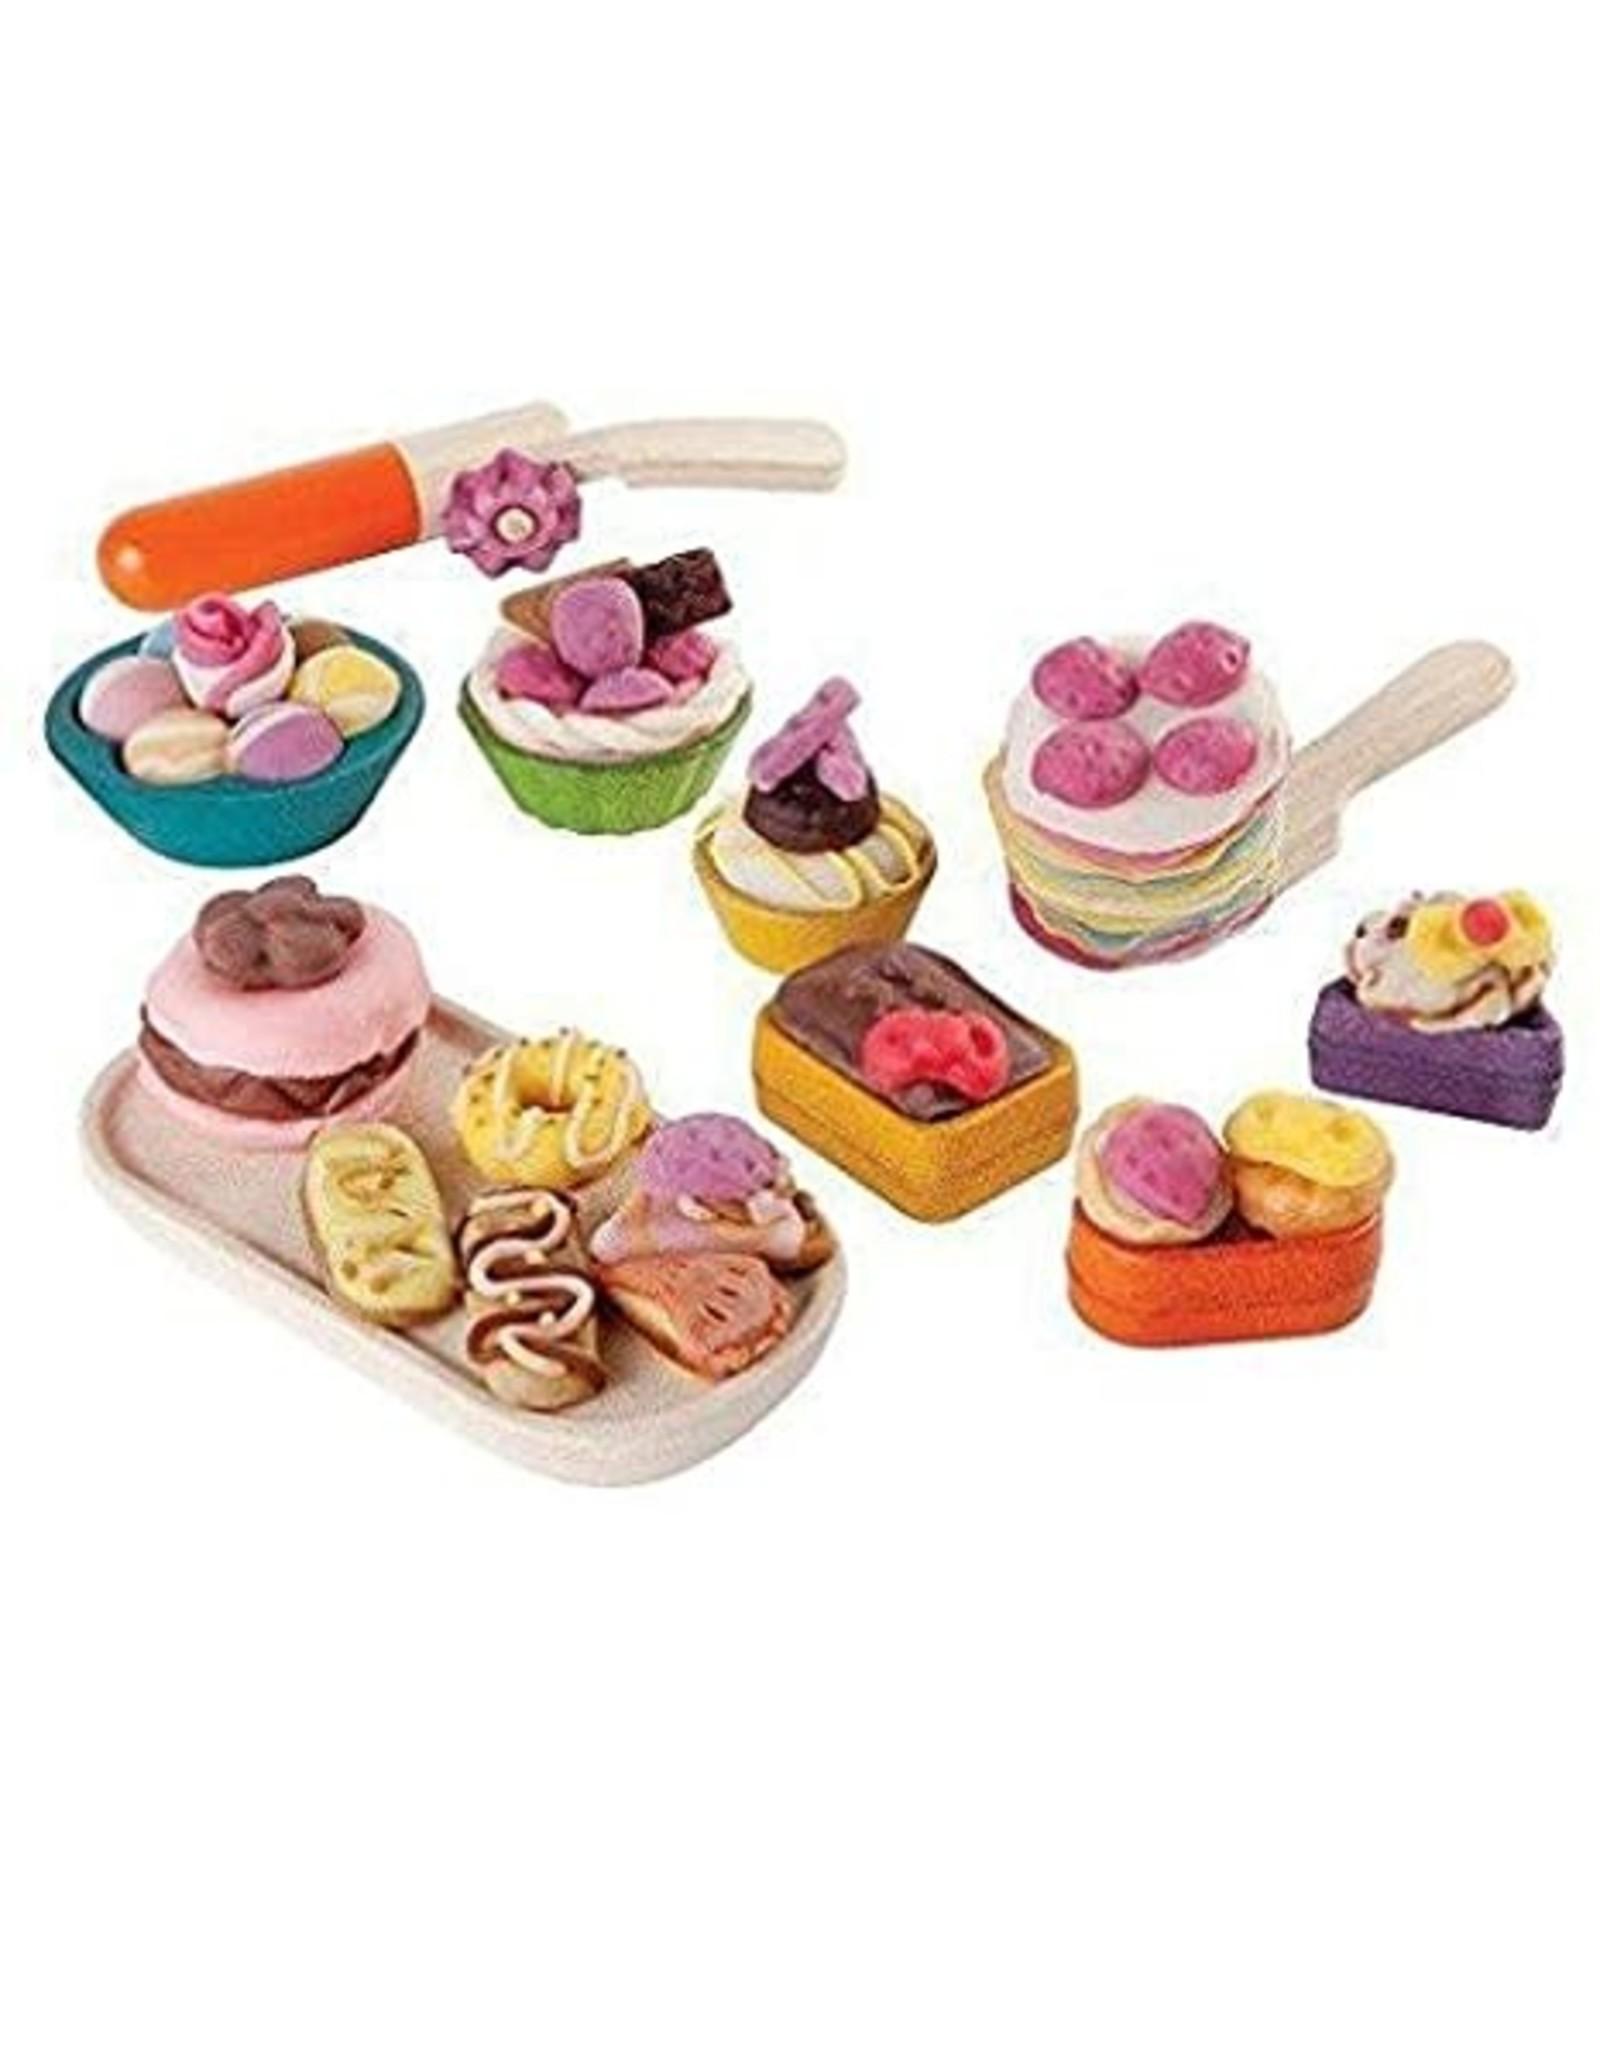 Plan Toys Pastry Dough Set